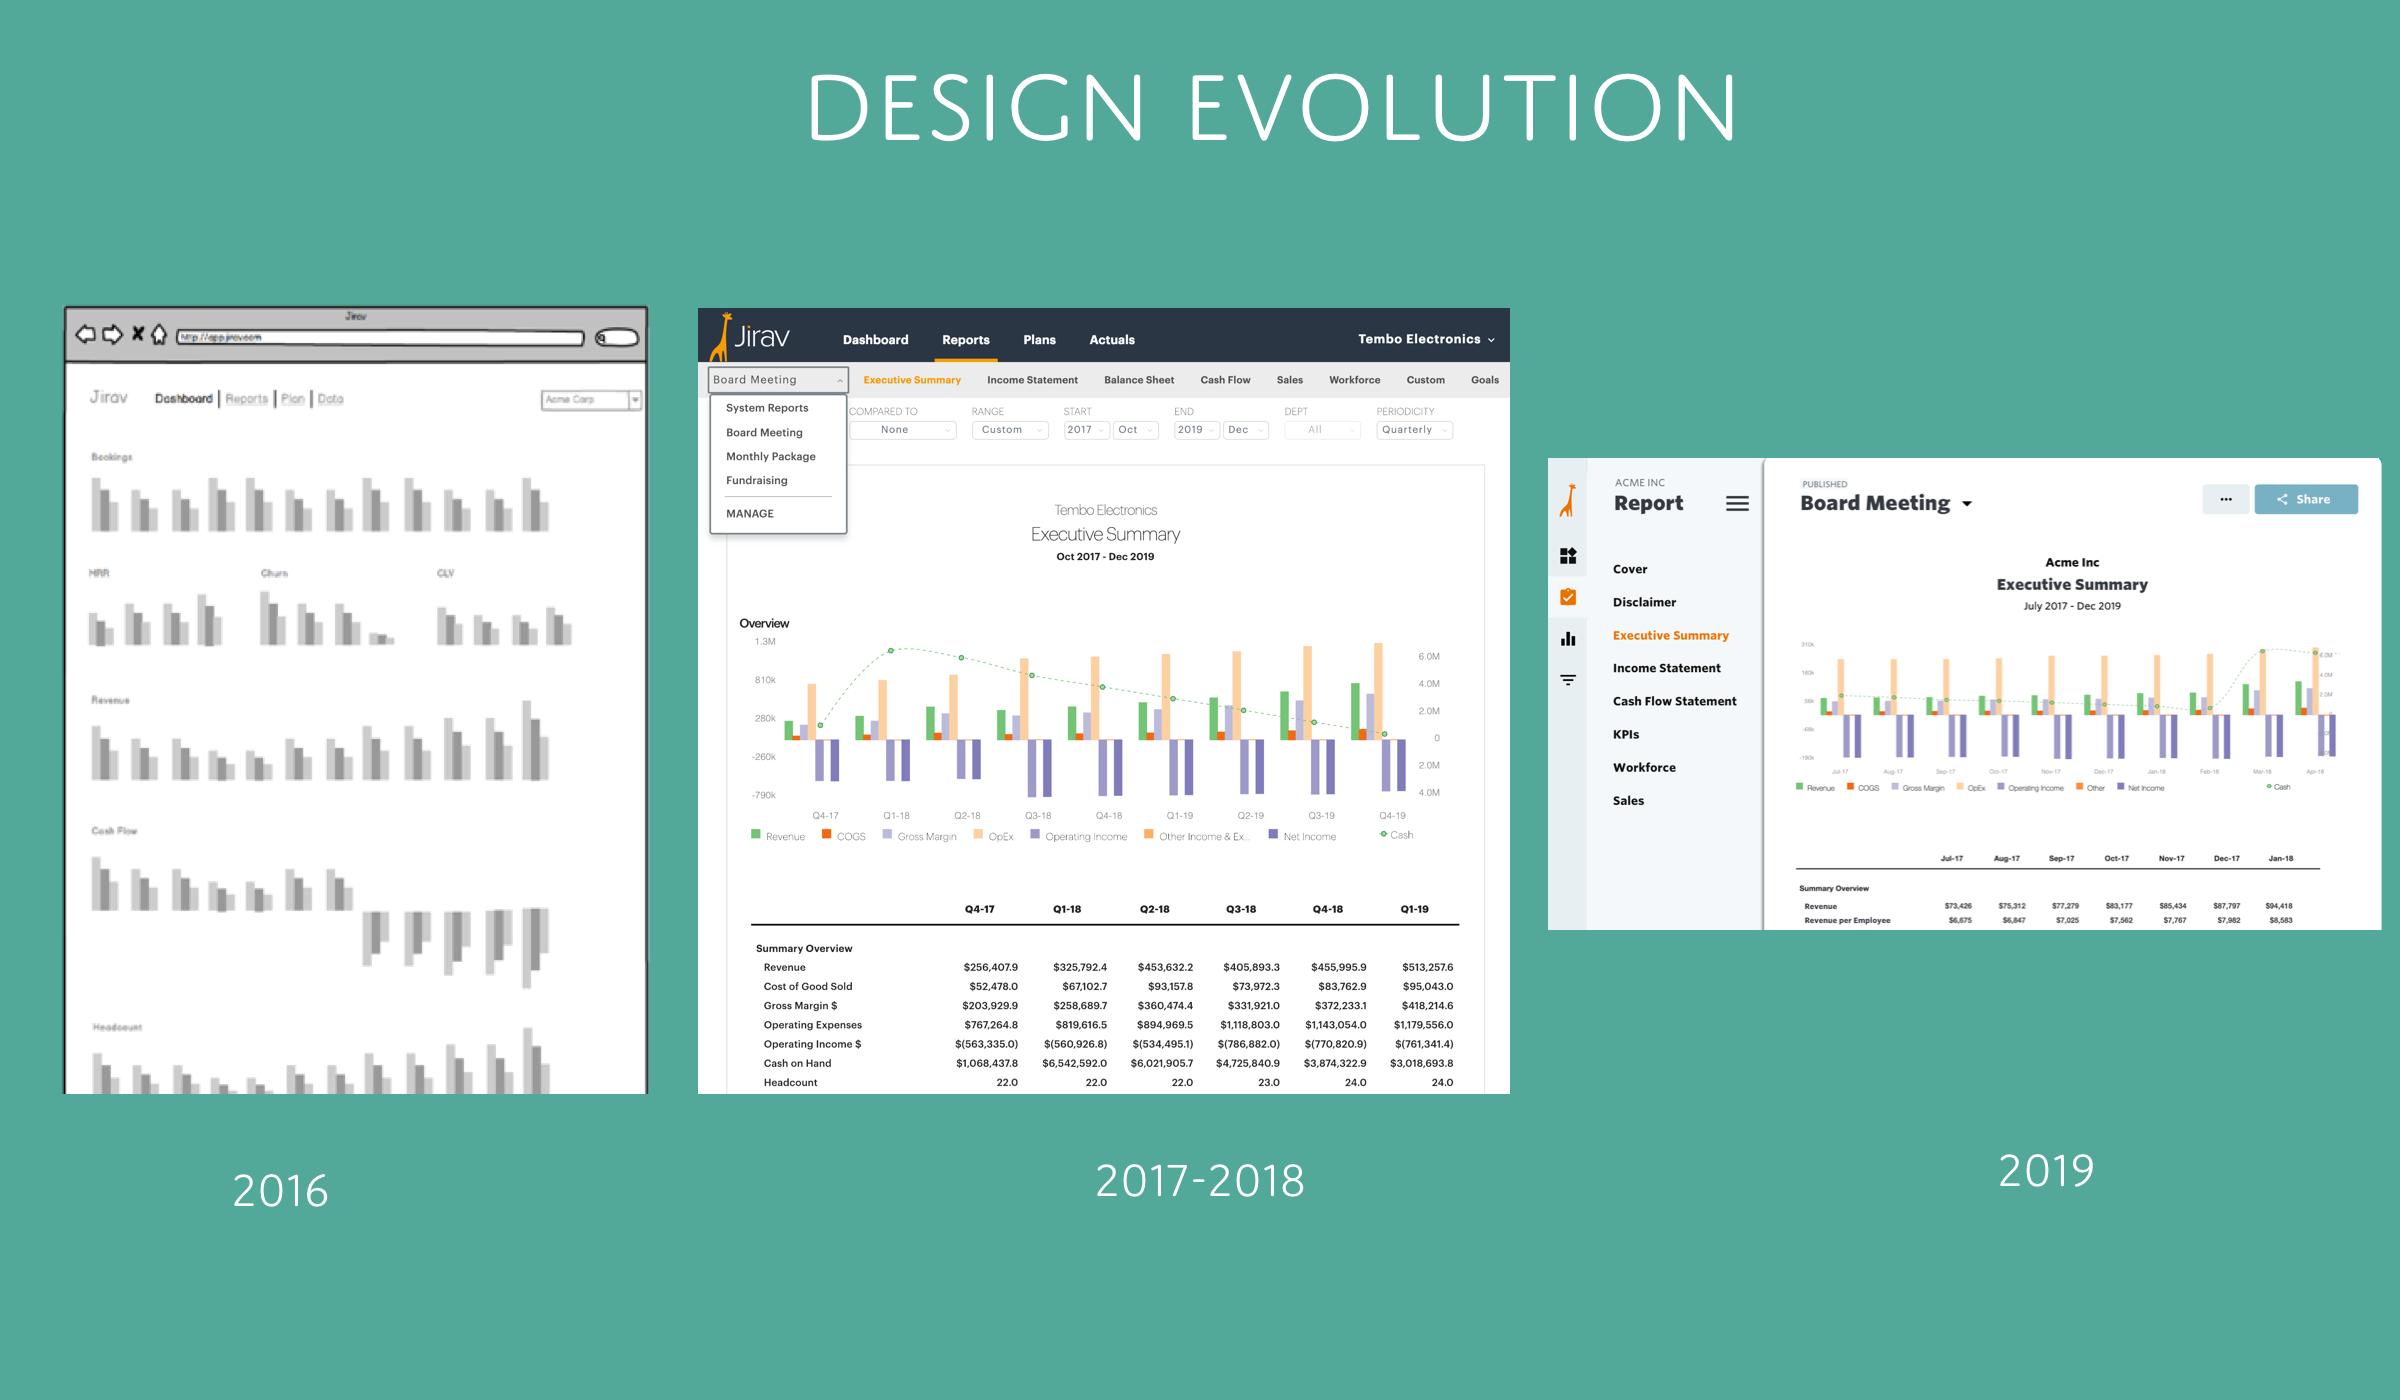 New Design Evolution